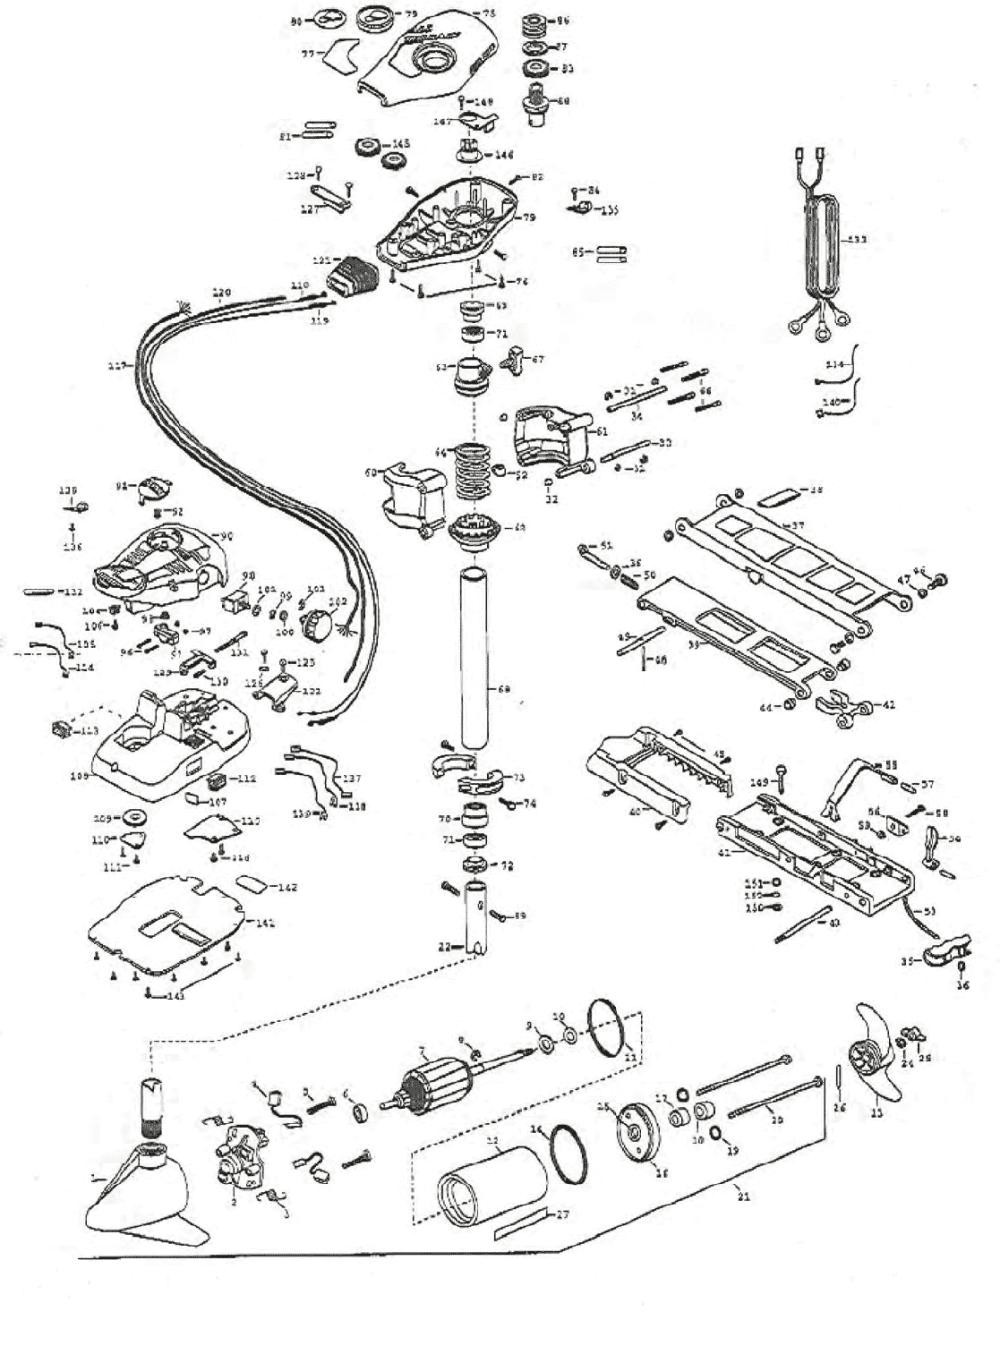 medium resolution of minn kota edge wiring diagram wiring diagramminn kota 65 wiring diagram best wiring libraryminn kota edge